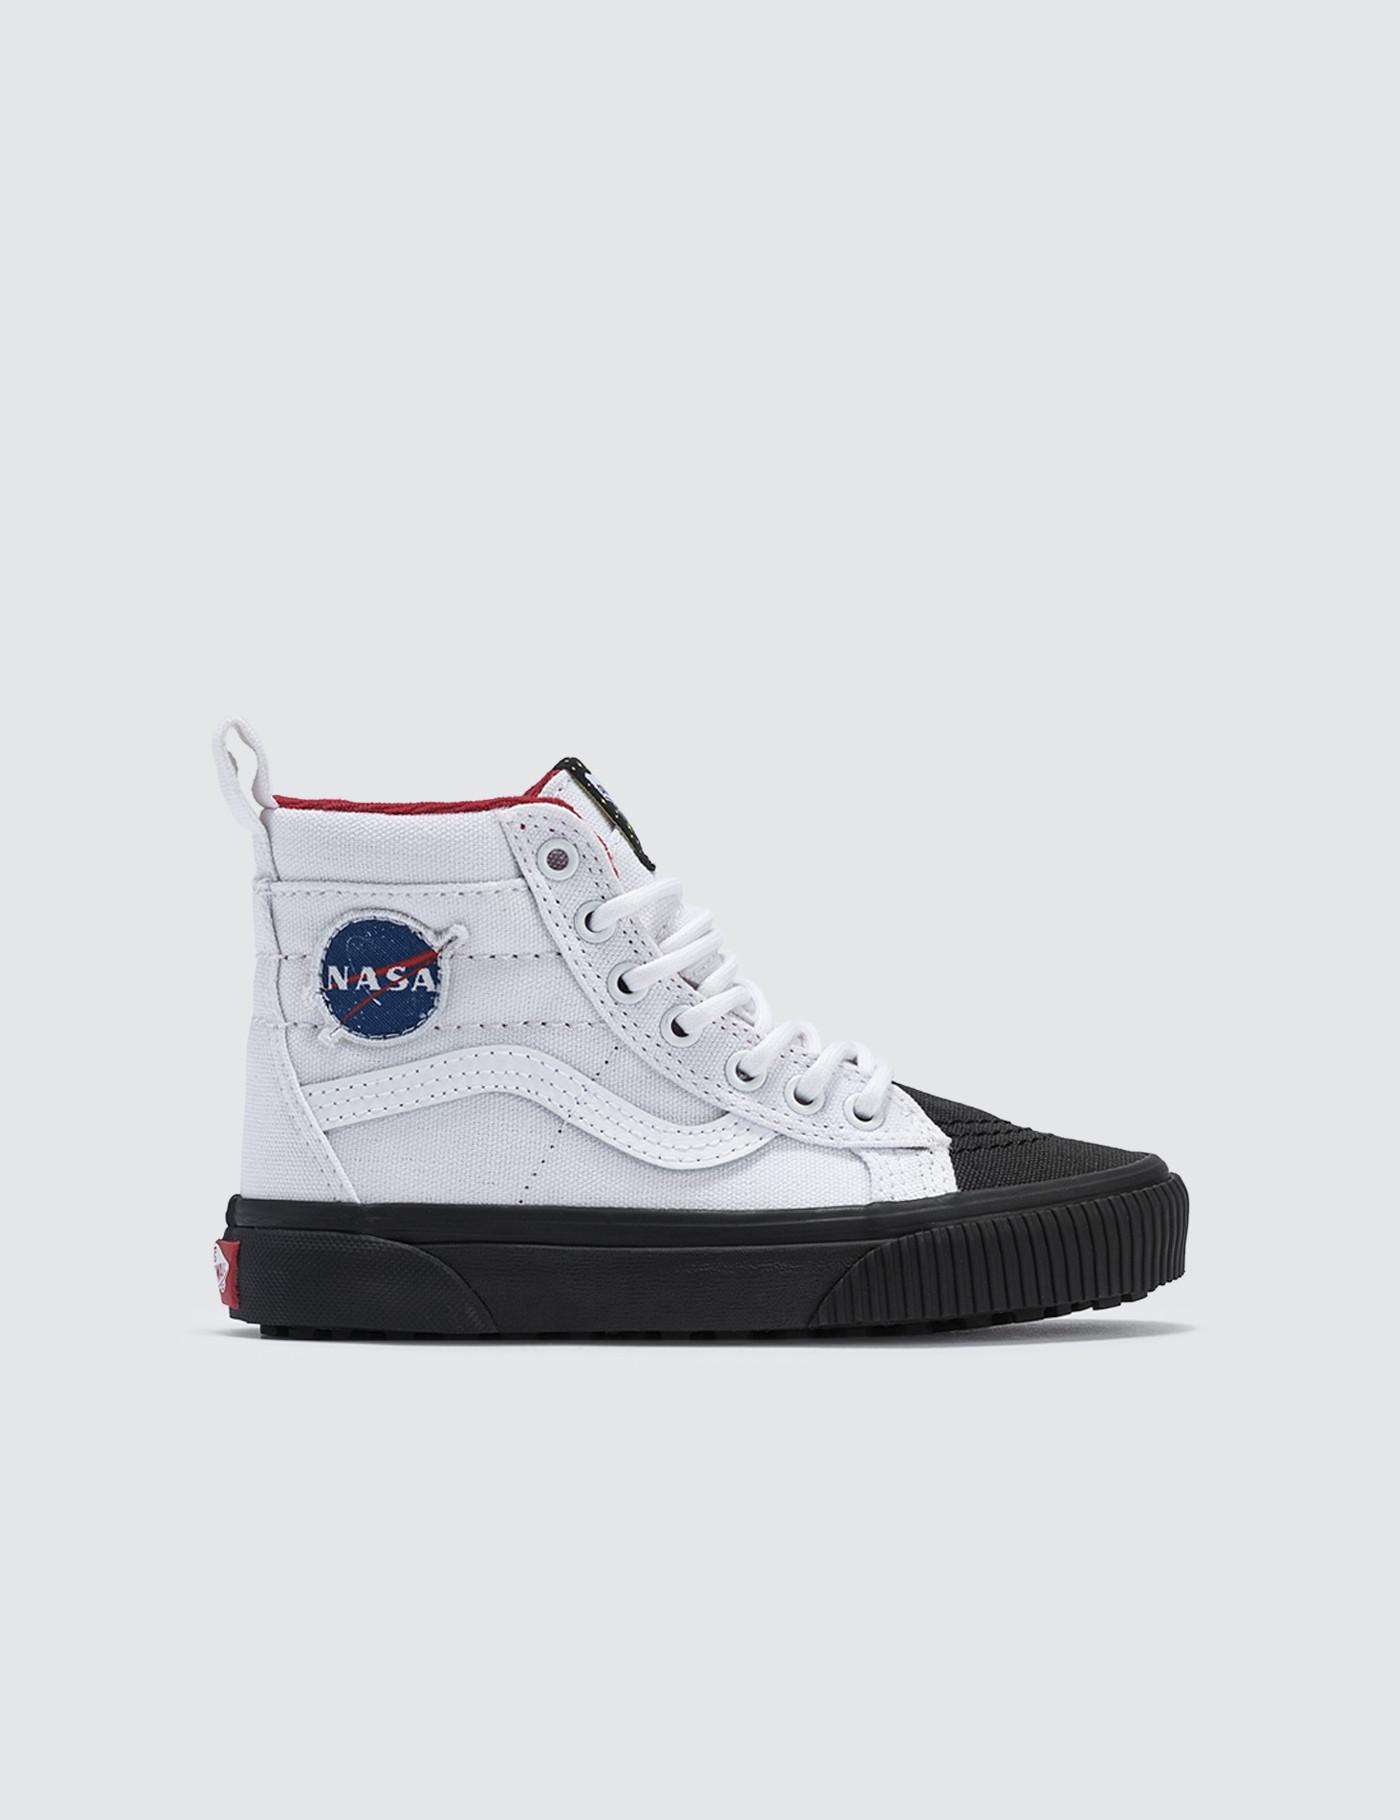 3051d976a39f6f Lyst - Vans Space Voyager Sk8-hi Mte Kids in White